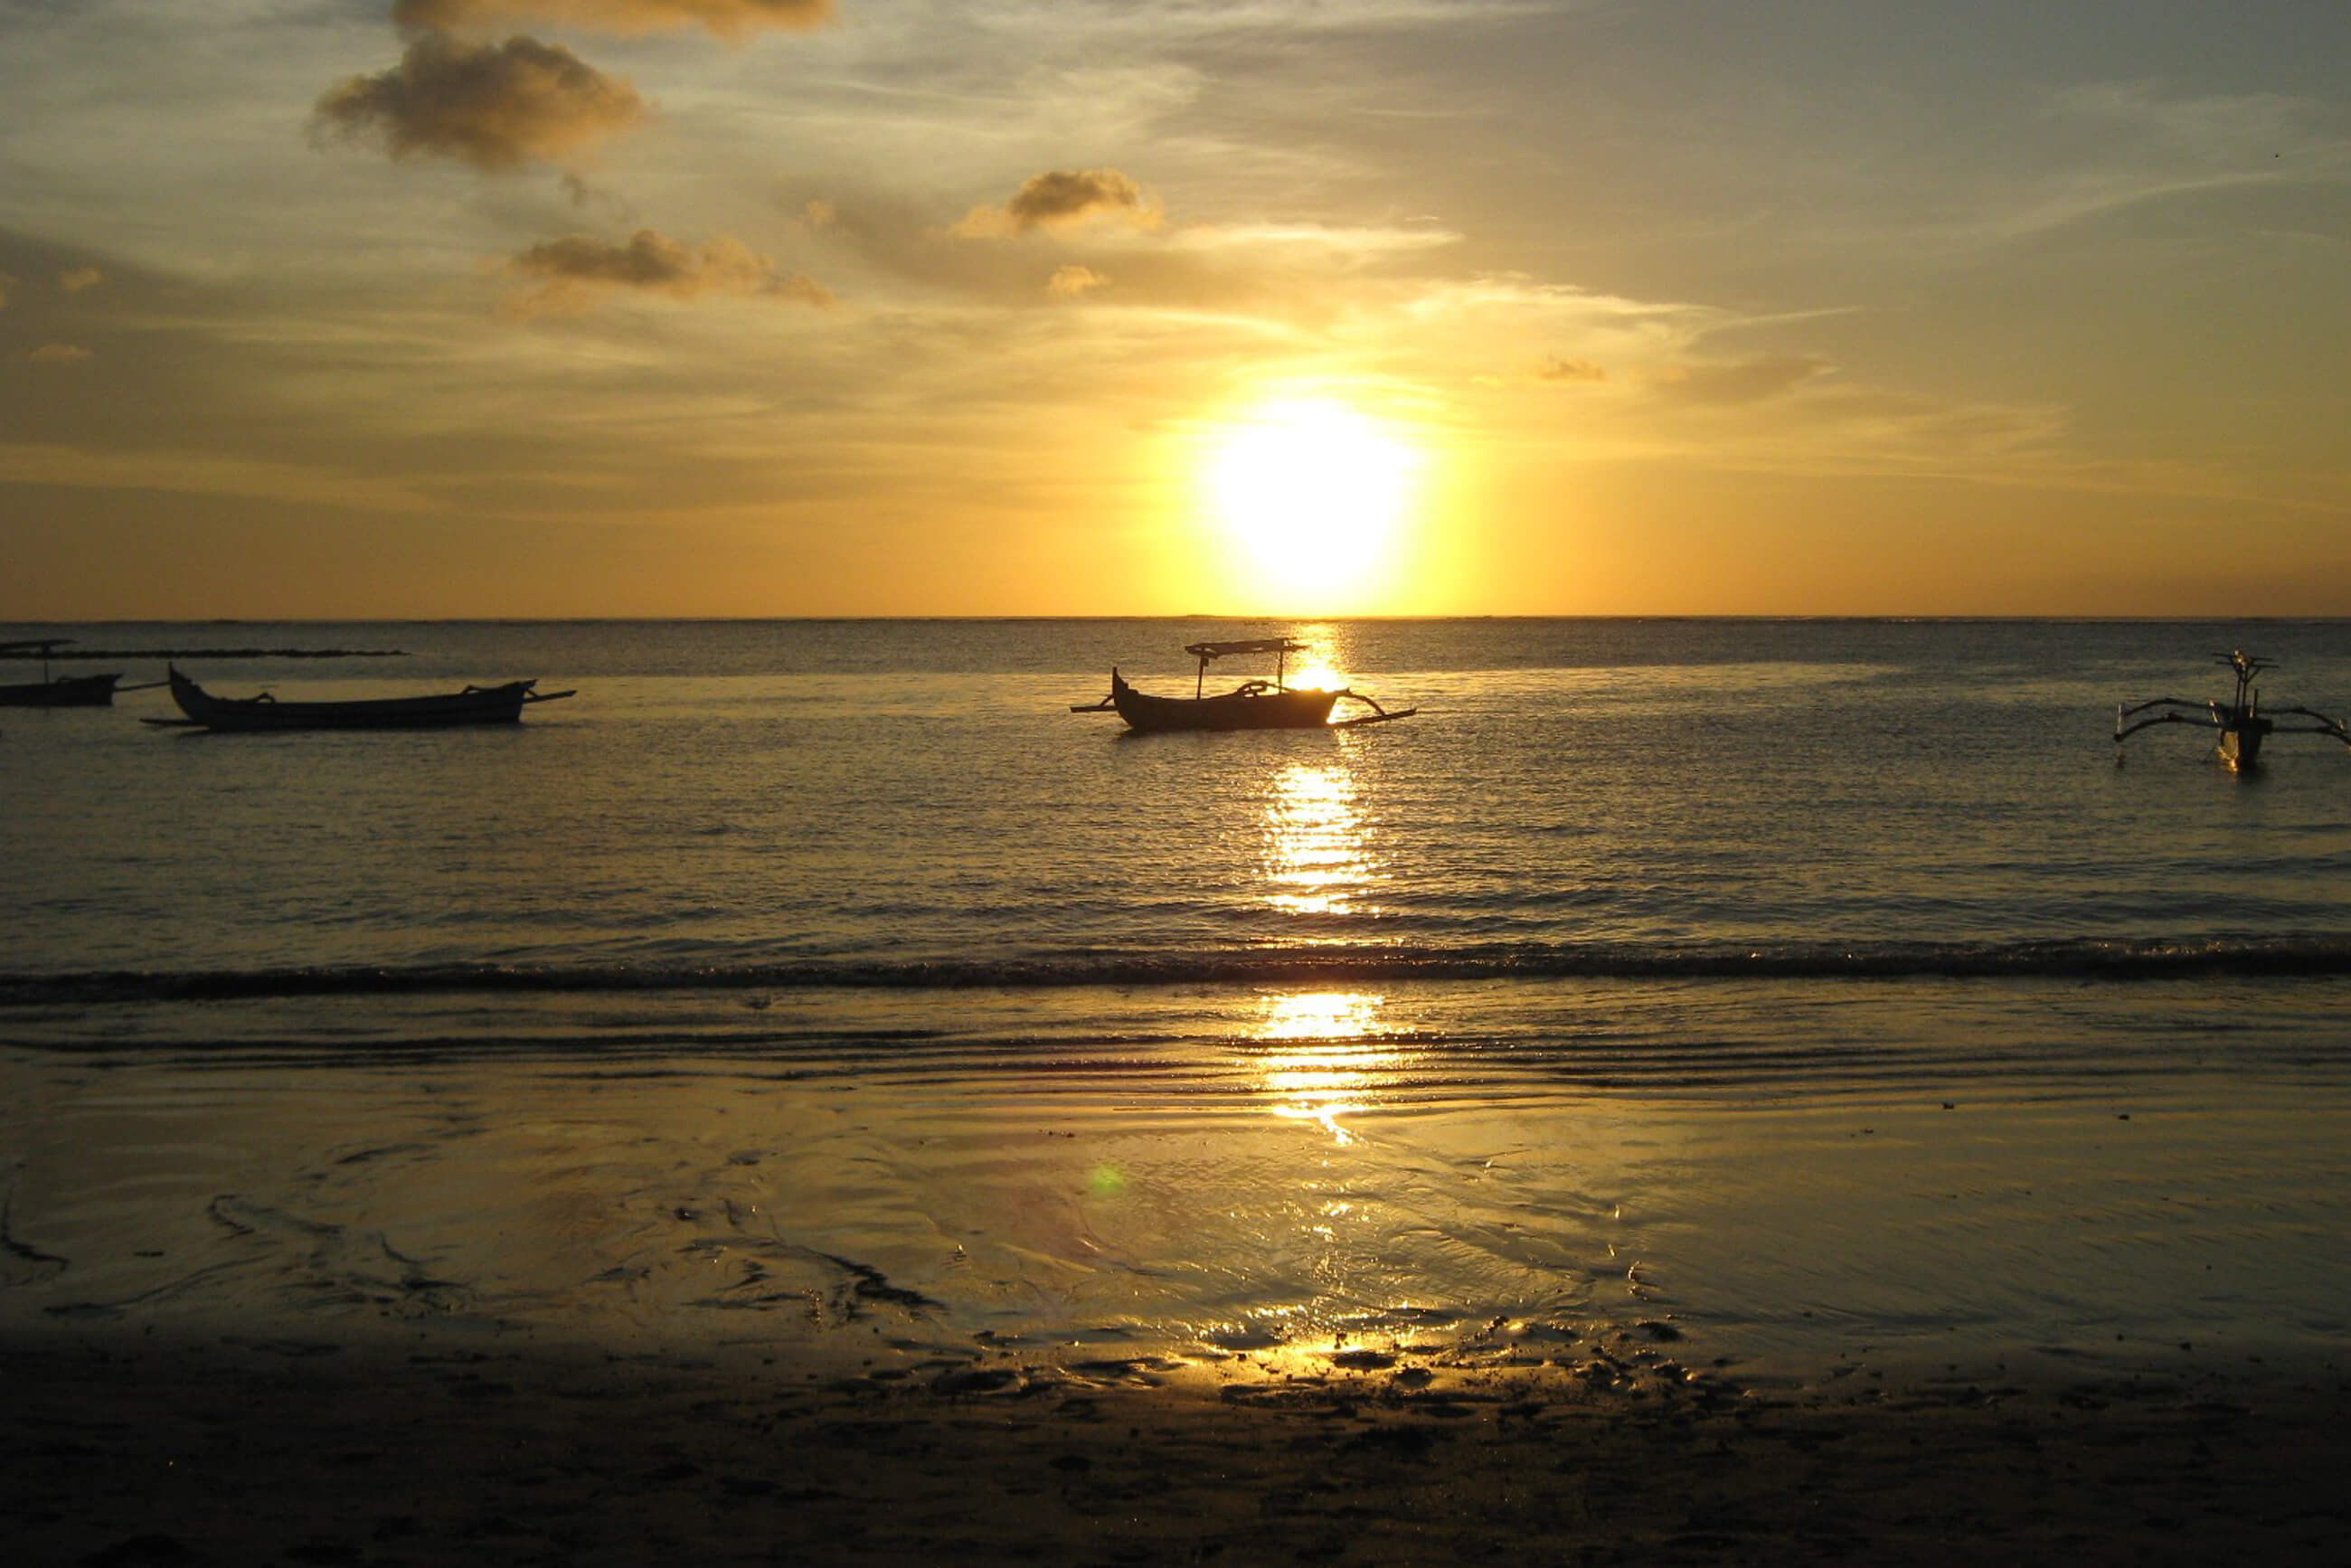 https://bubo.sk/uploads/galleries/4931/pixabay_indonezia_beach-61130-1-.jpg